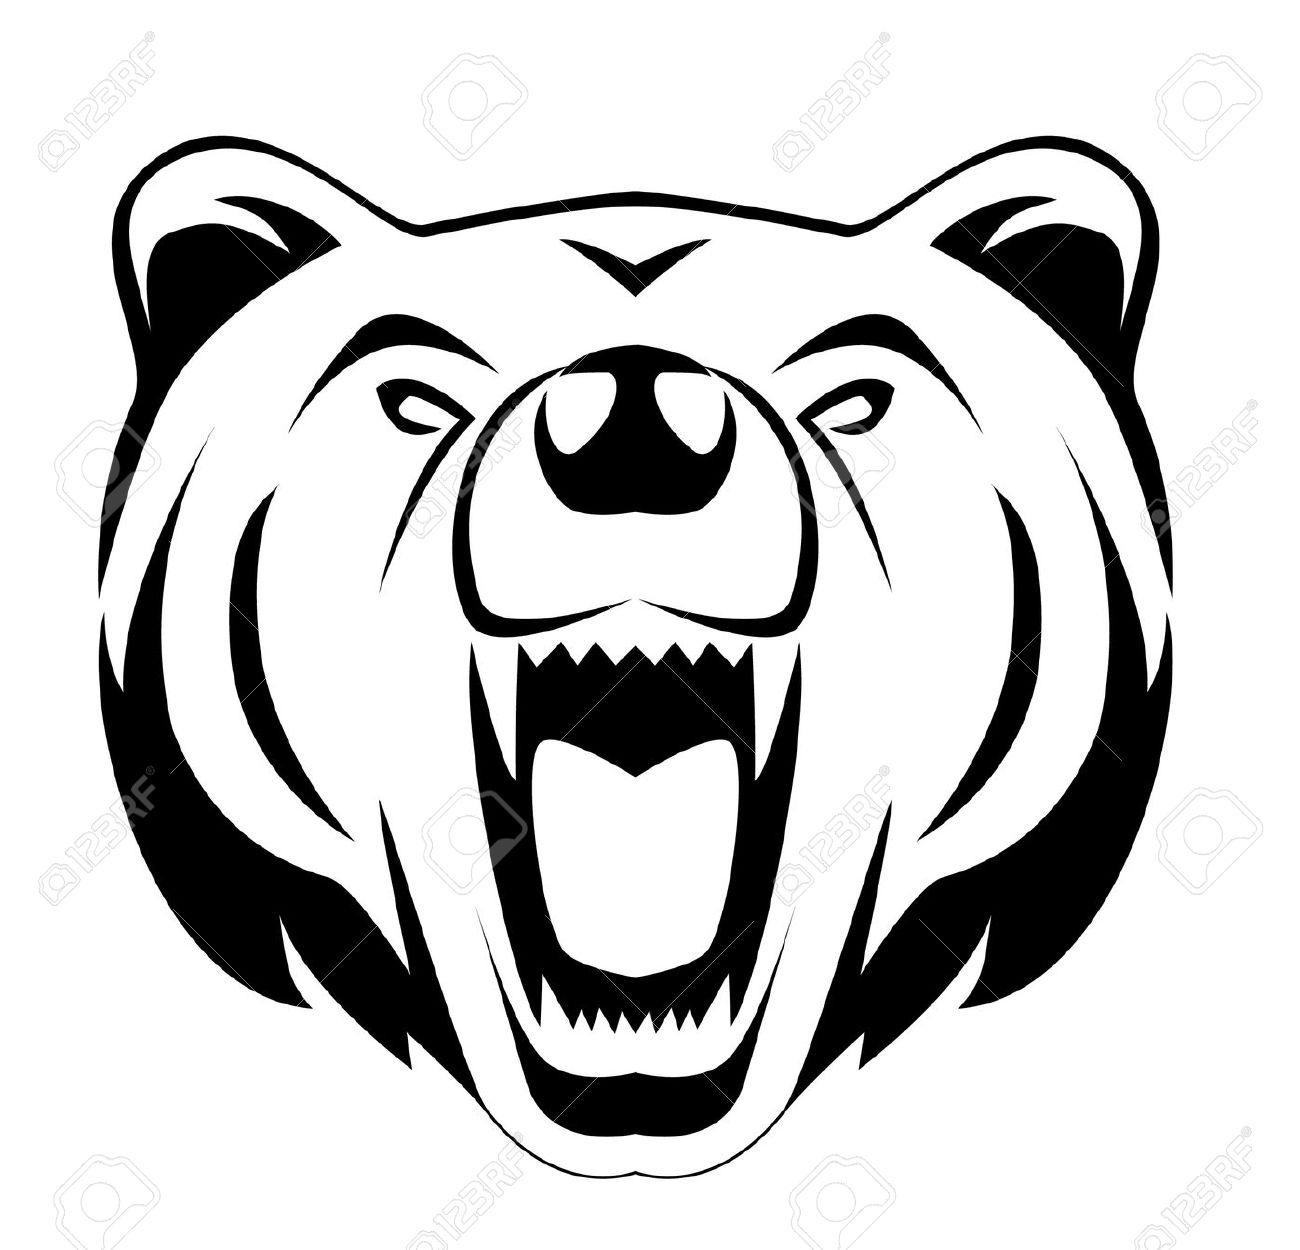 Bear head silhouette clipart banner freeuse download Bear Head Cliparts | Free download best Bear Head Cliparts on ... banner freeuse download